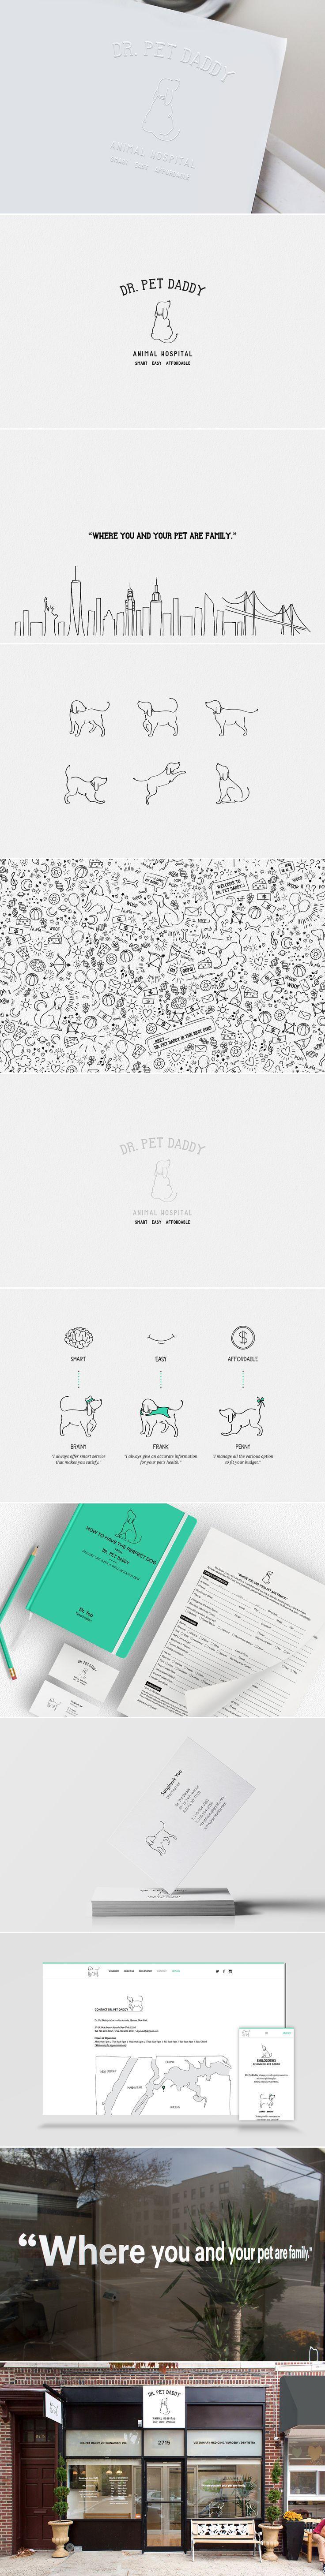 best logo concept images on pinterest animal logo pet logo